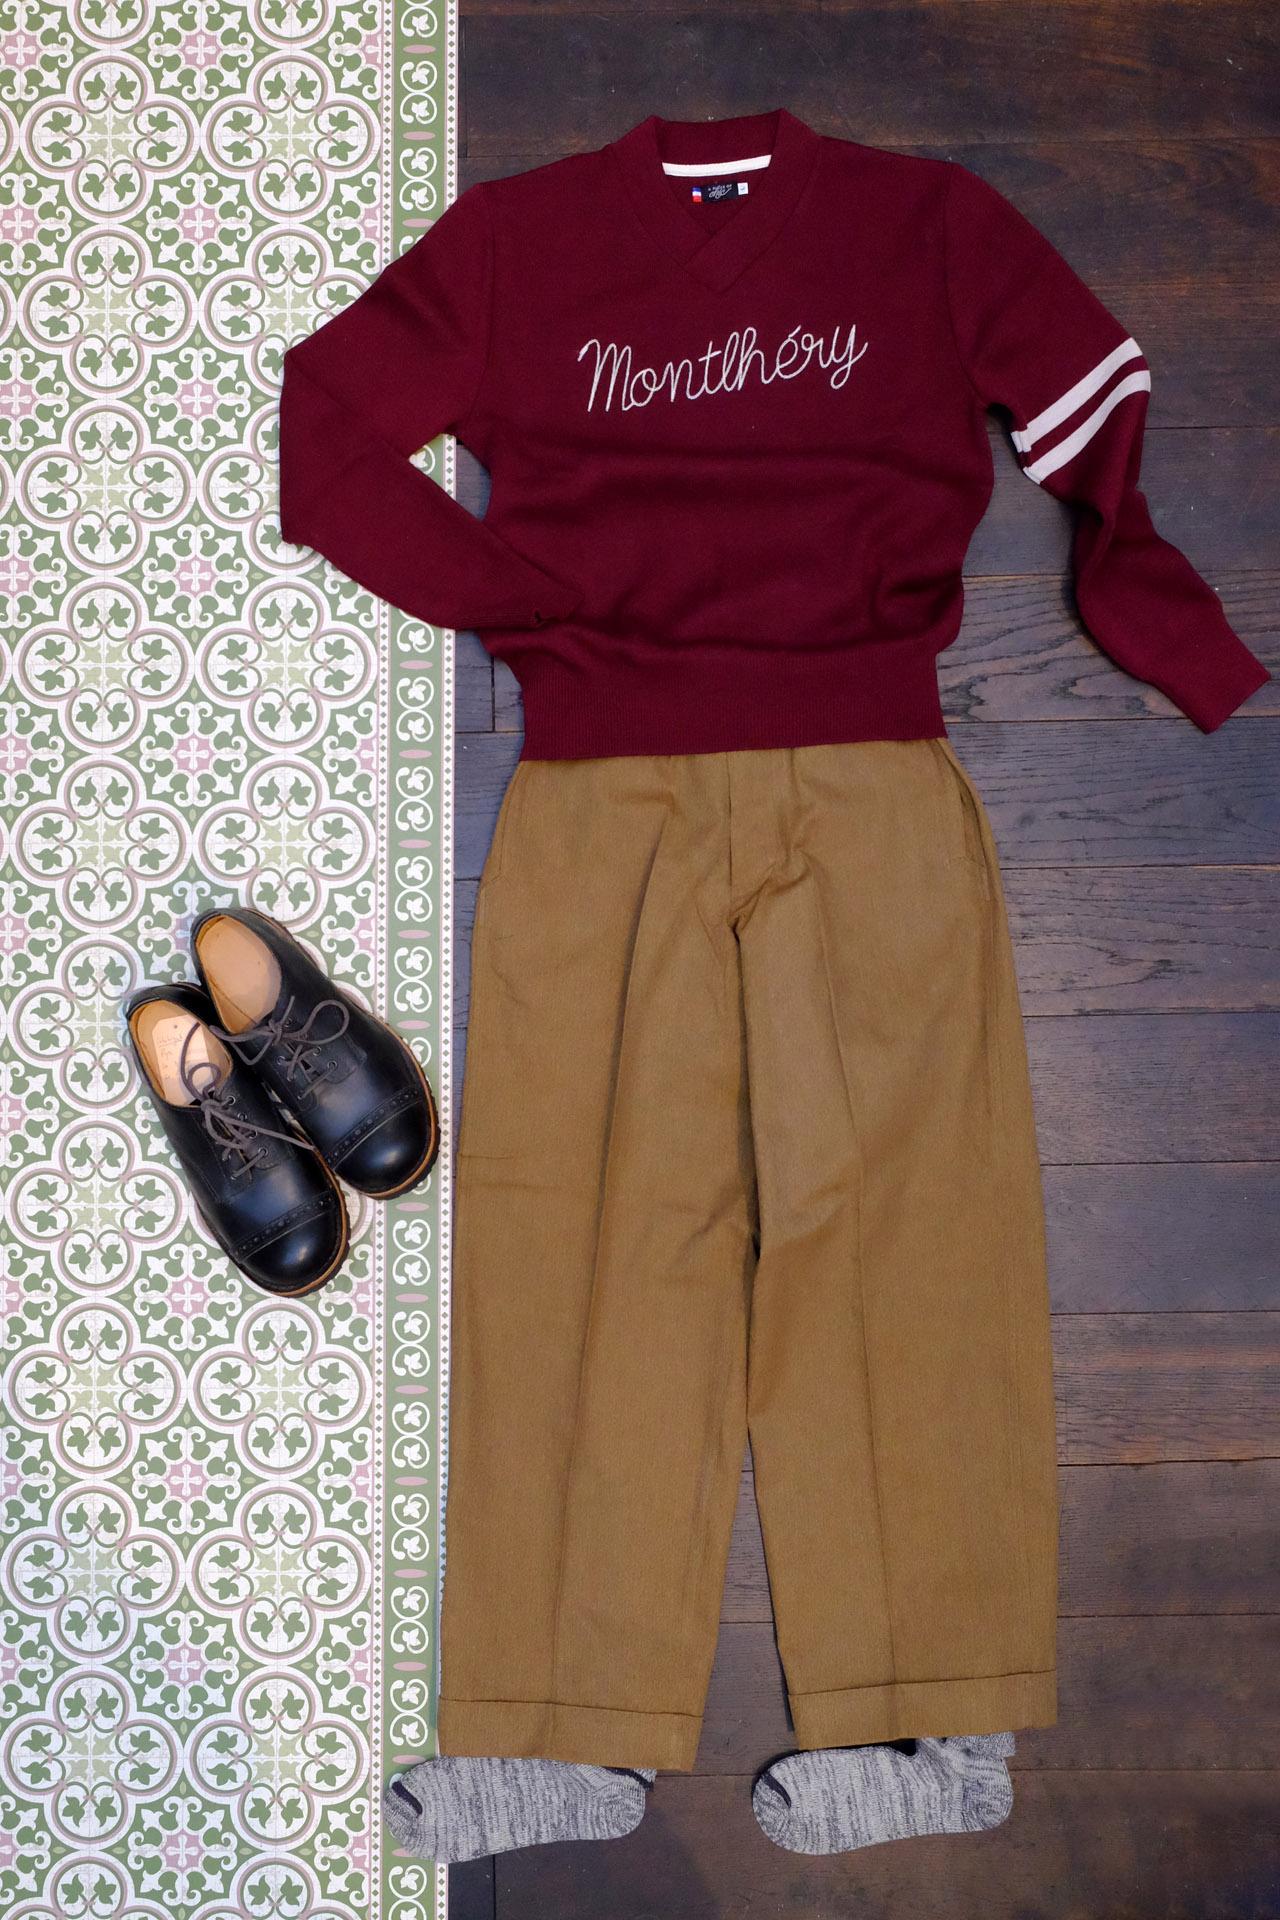 haversack-hose-beige-apieceofchic-pullover-vintagestyle-heritage